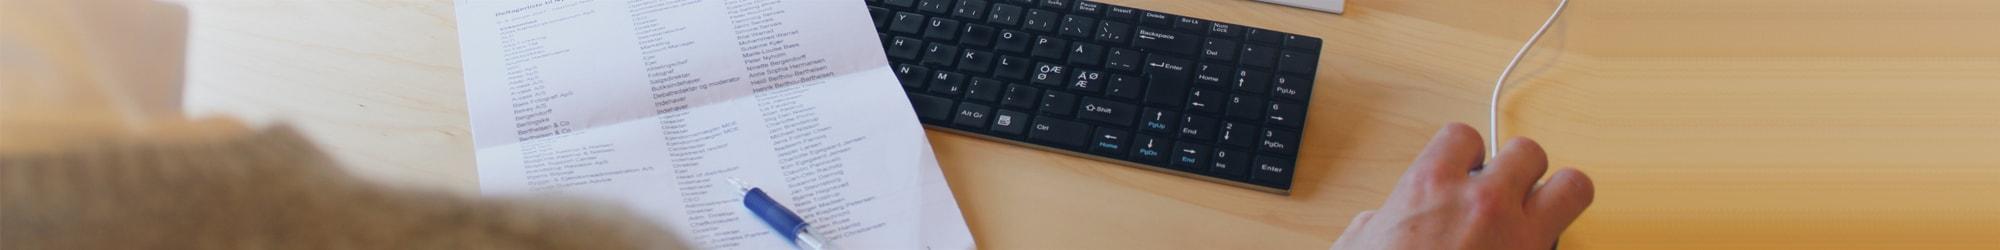 Overshoulder papir kuglepen keyboard